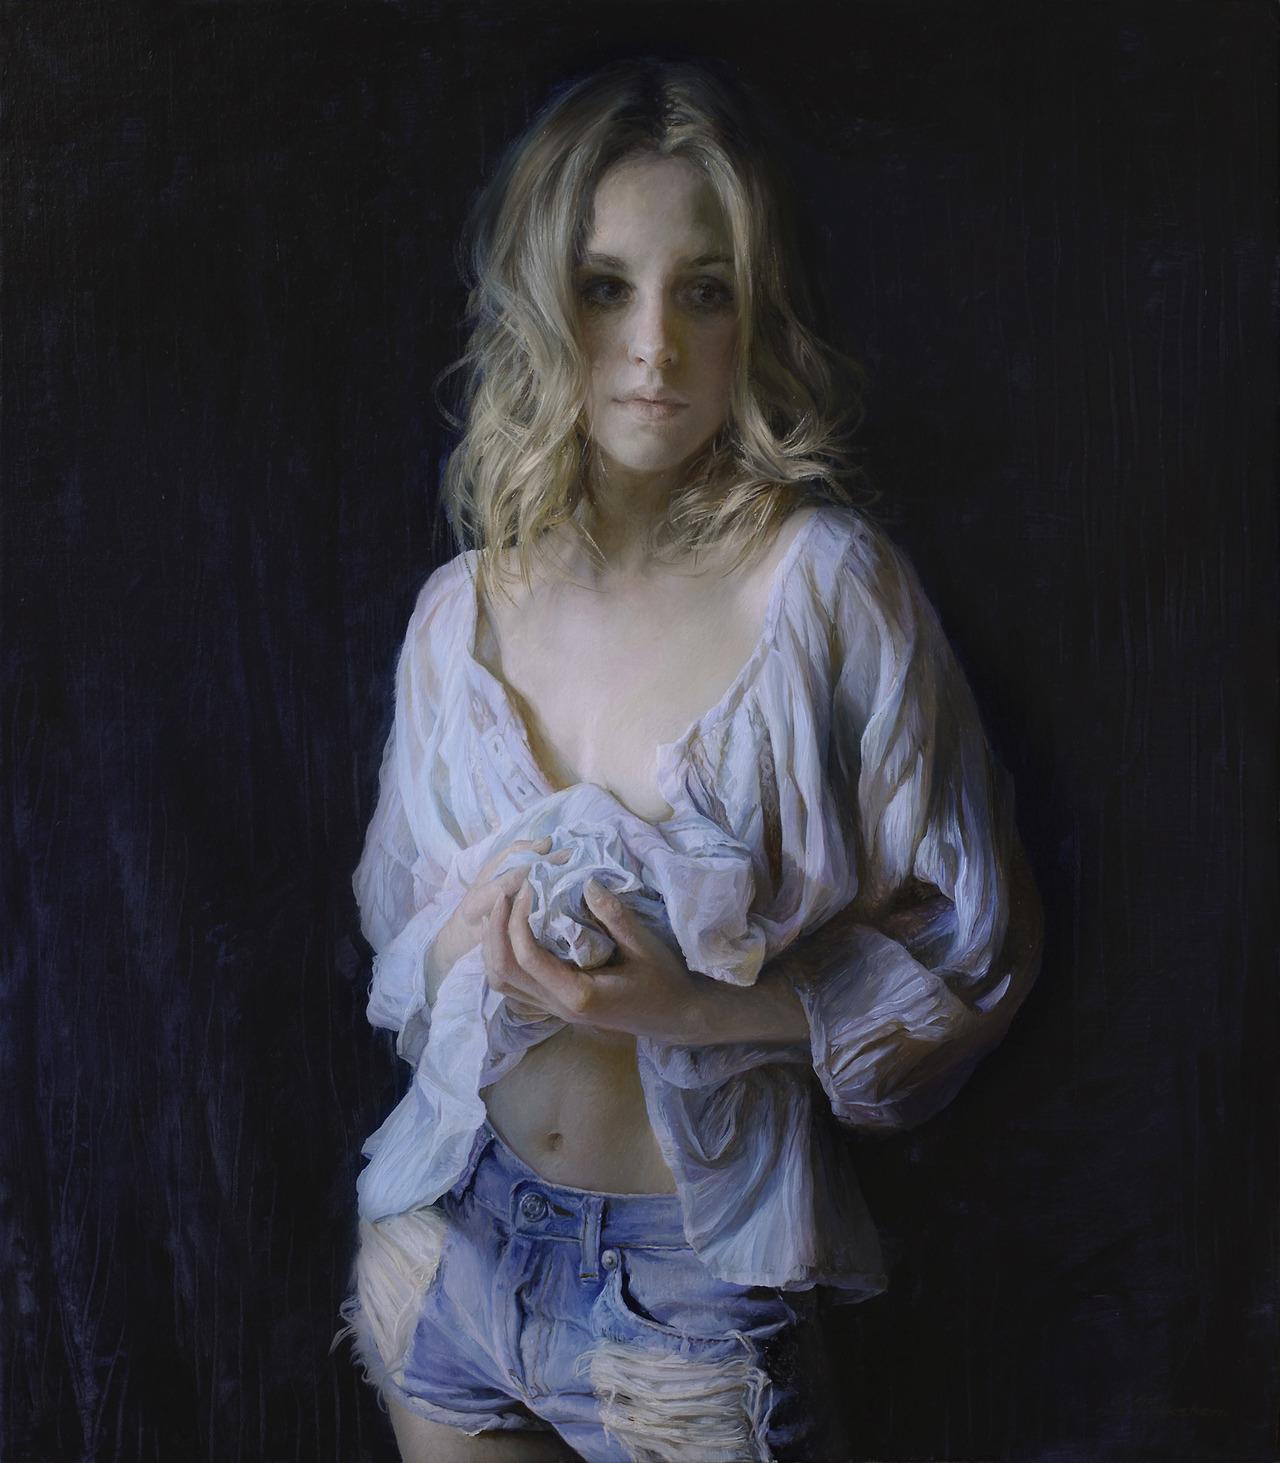 Women's images by a Russian realist artist Sergey Marshennikov - 36